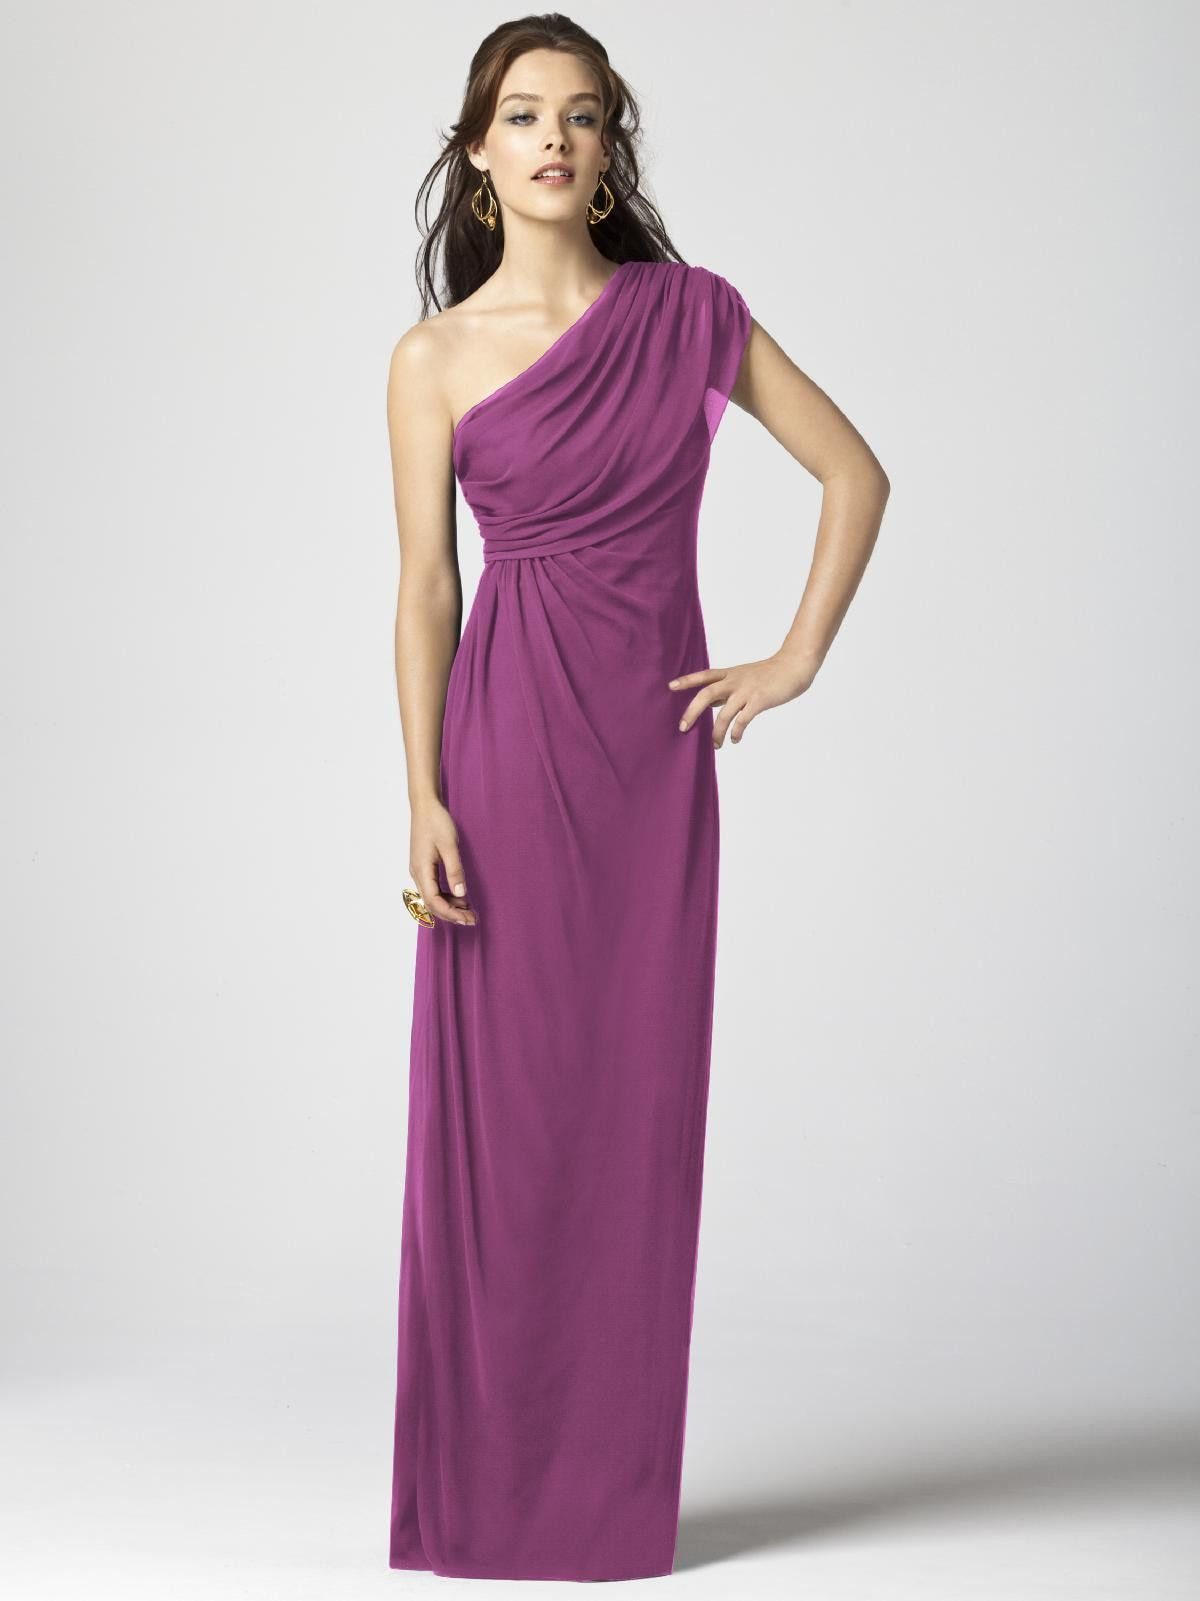 This beautiful chiffon dessy bridesmaids dress drapes effortlessly